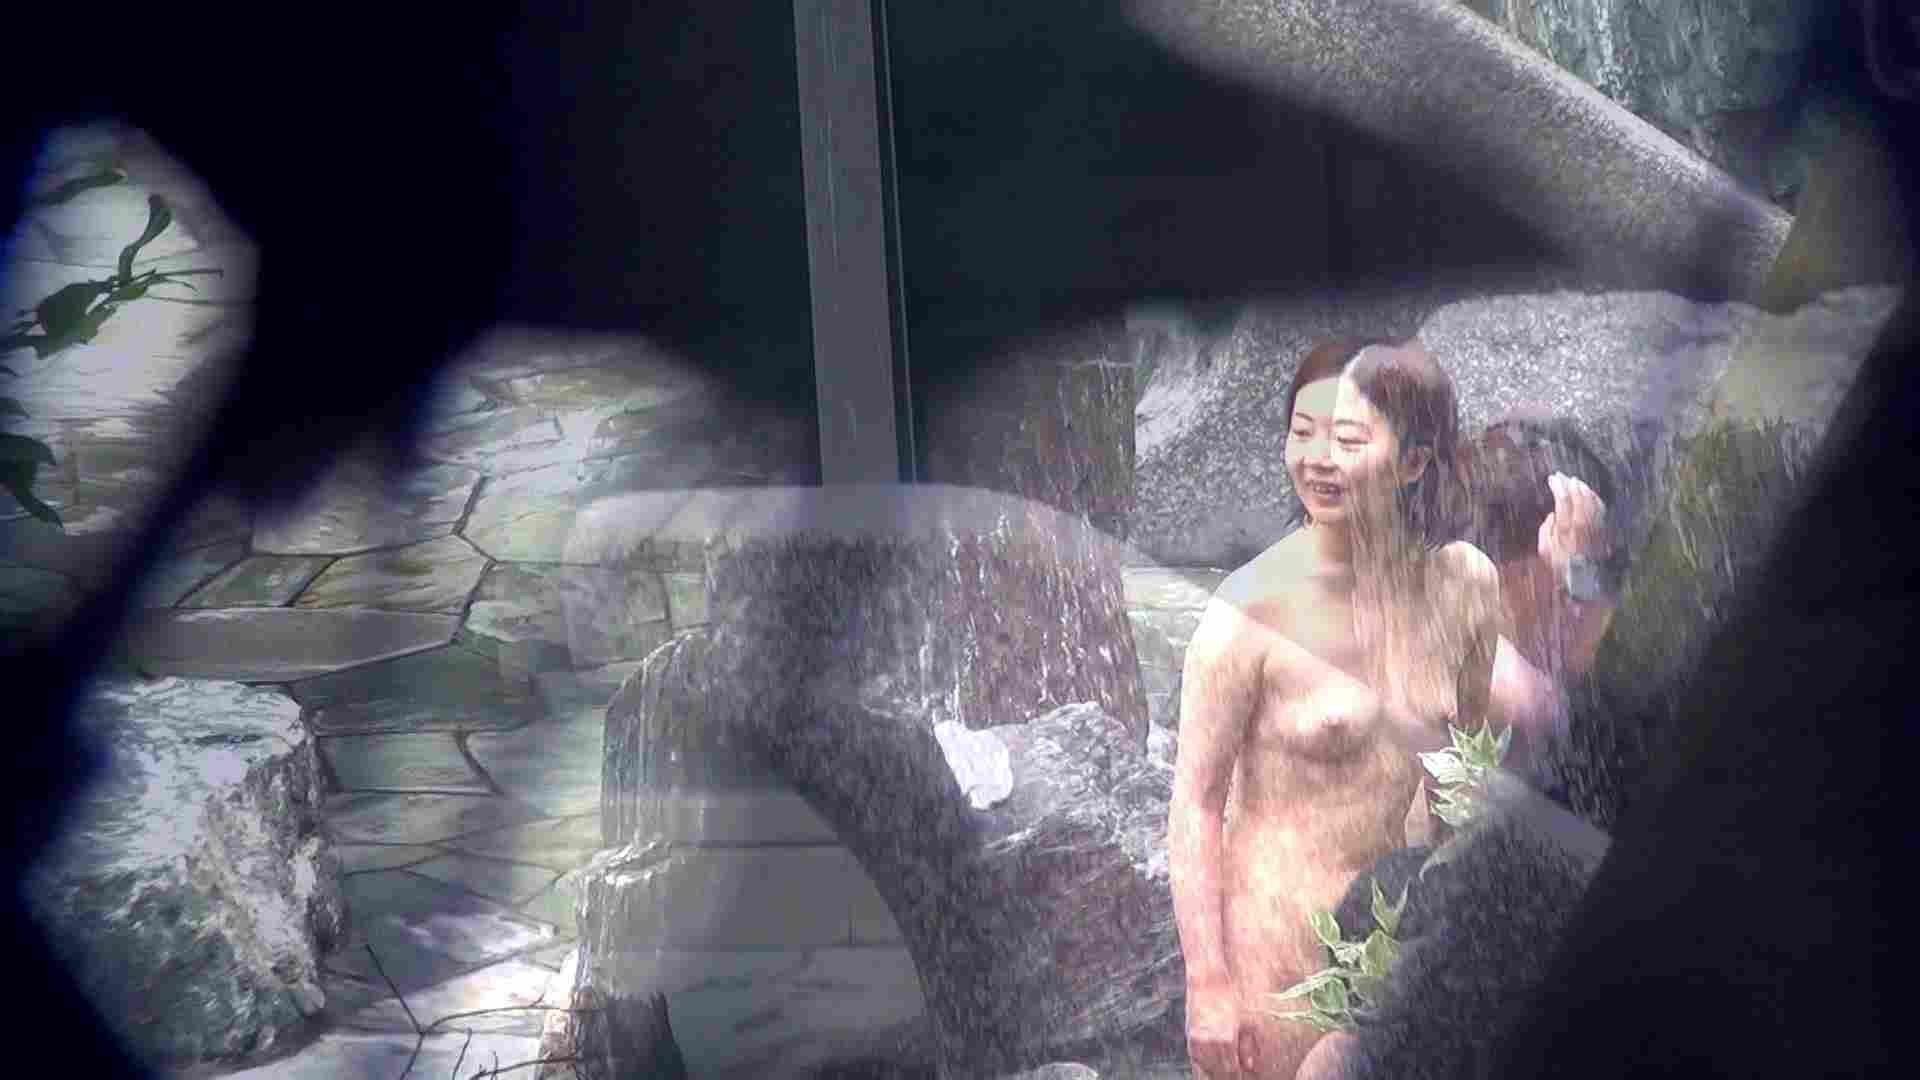 Aquaな露天風呂Vol.276 盗撮師作品  87pic 21